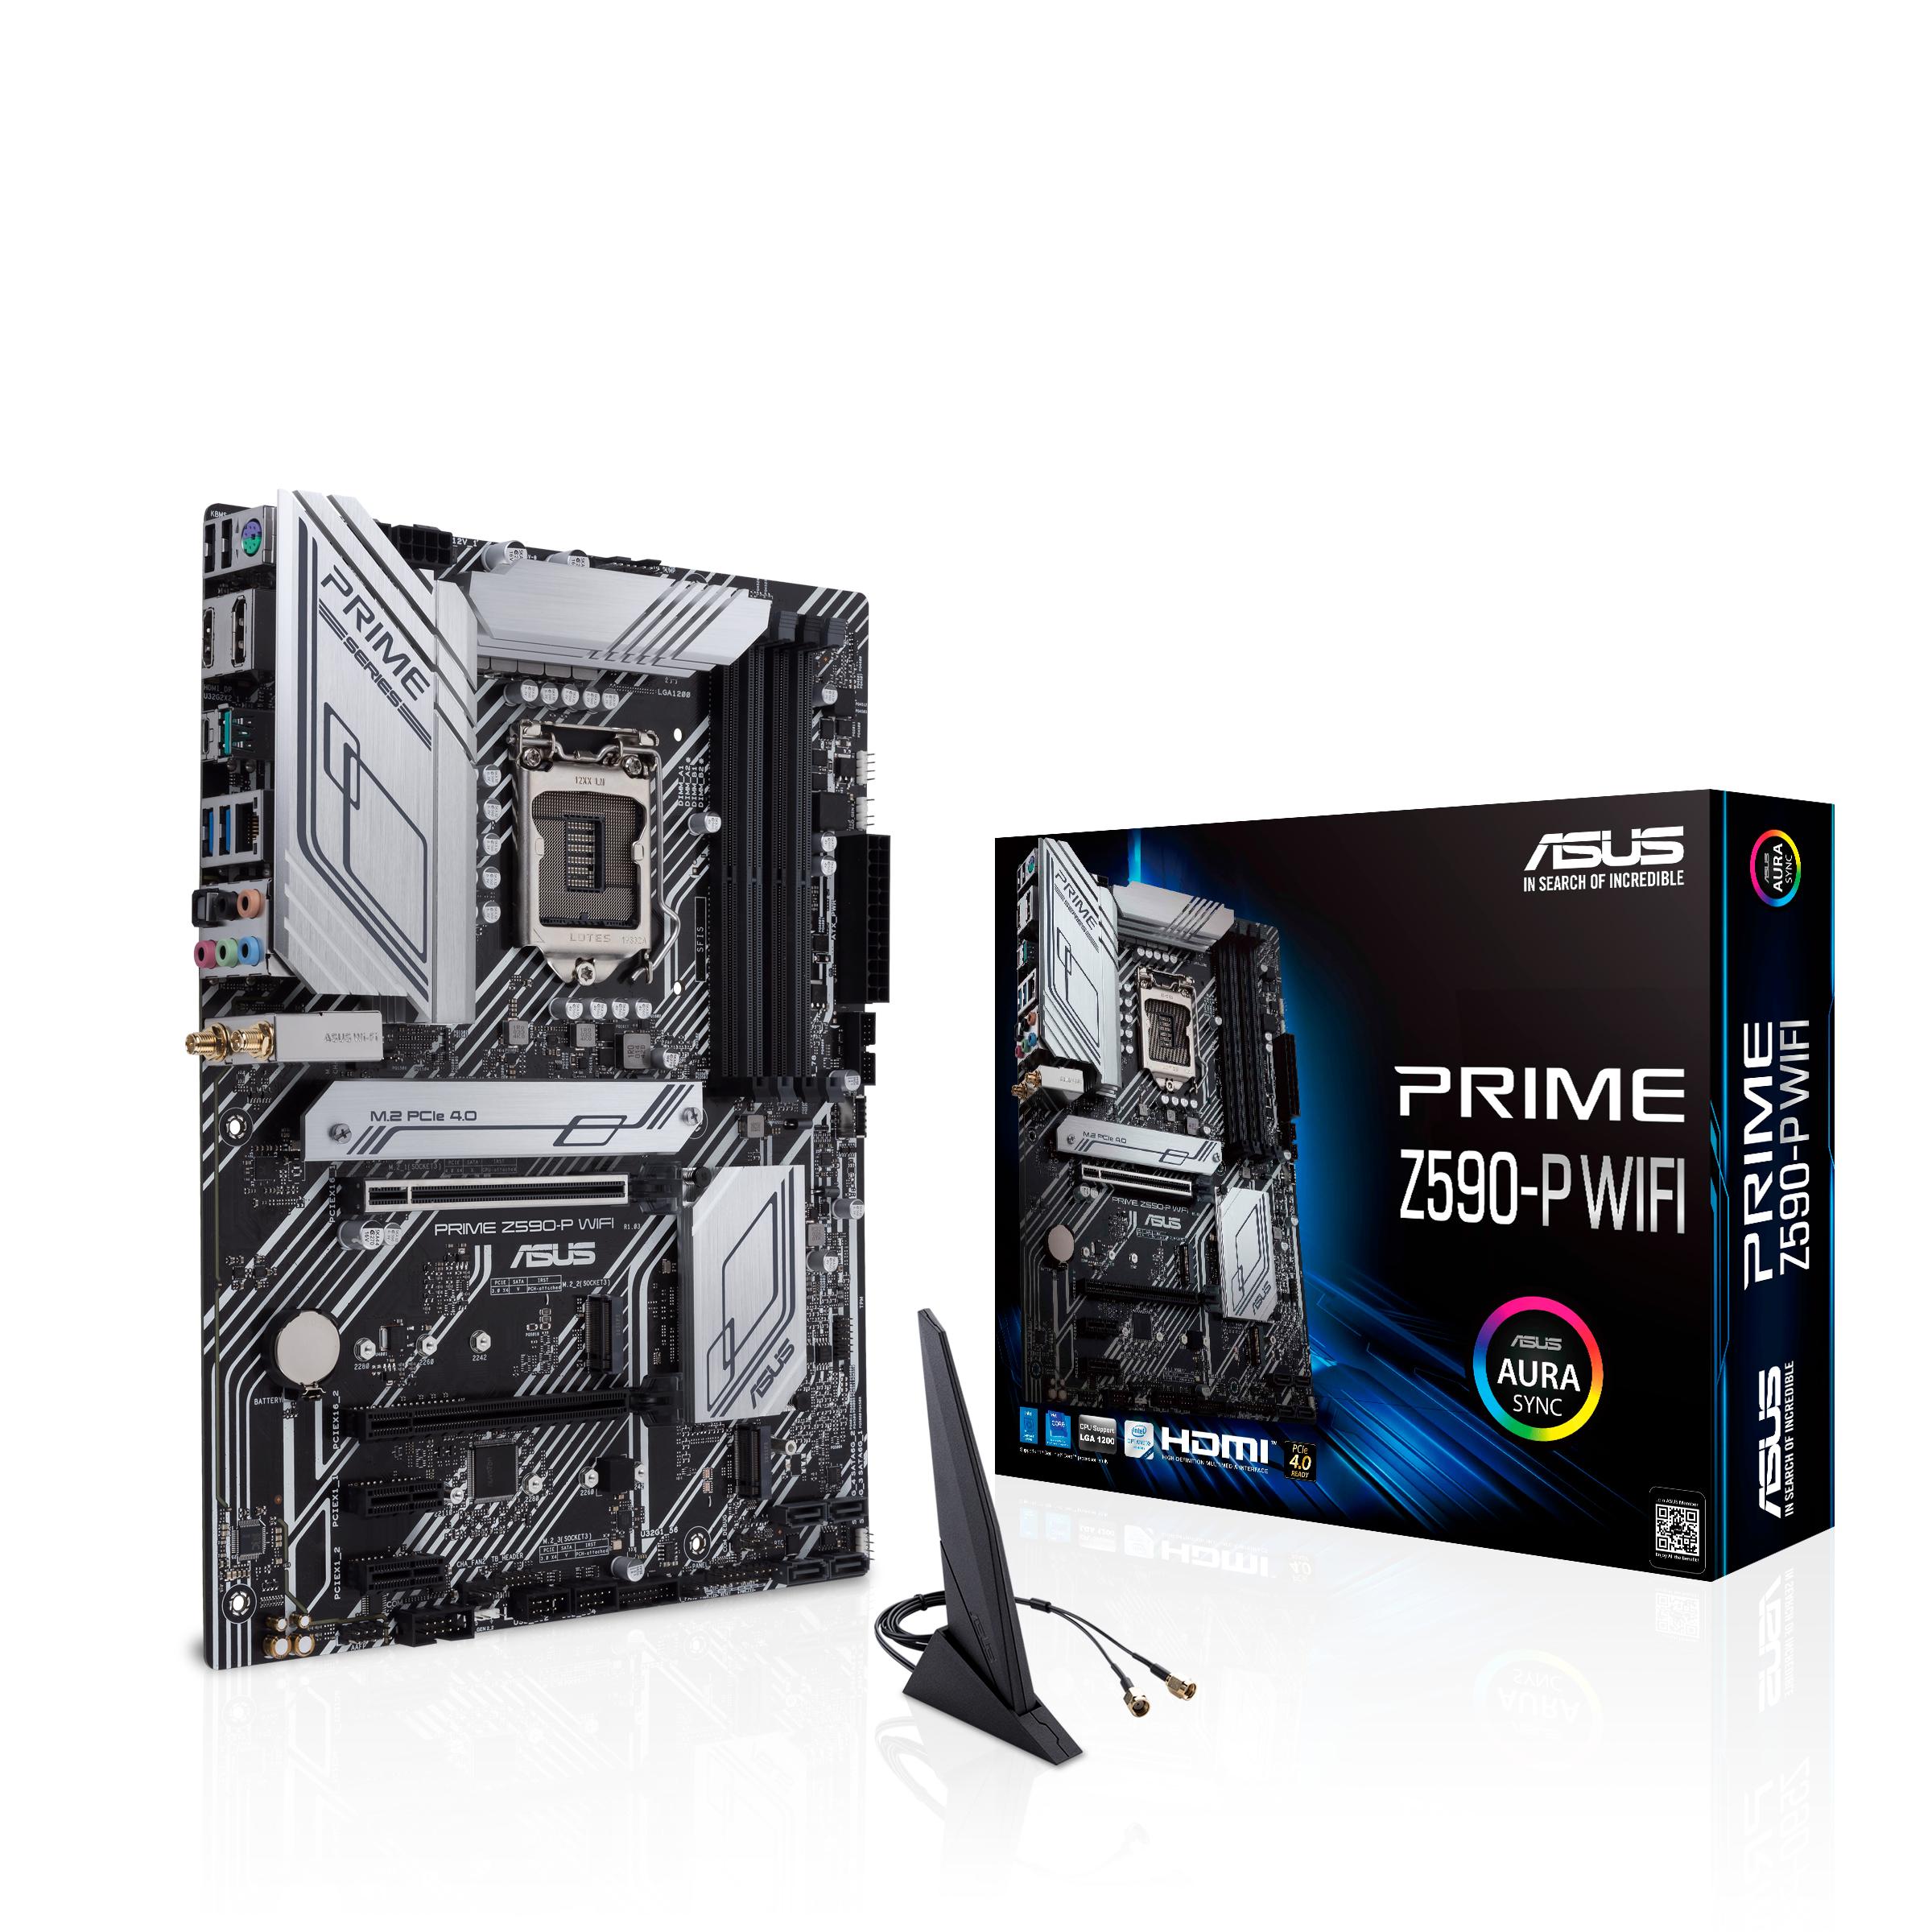 ASUS PRIME Z590-P WIFI - Motherboard - ATX - LGA1200-Sockel - Z590 - USB-C Gen1, USB 3.2 Gen 1, USB 3.2 Gen 2, USB-C Gen 2x2 - 2.5 Gigabit LAN, Wi-Fi, Bluetooth - Onboard-Grafik (CPU erforderlich)